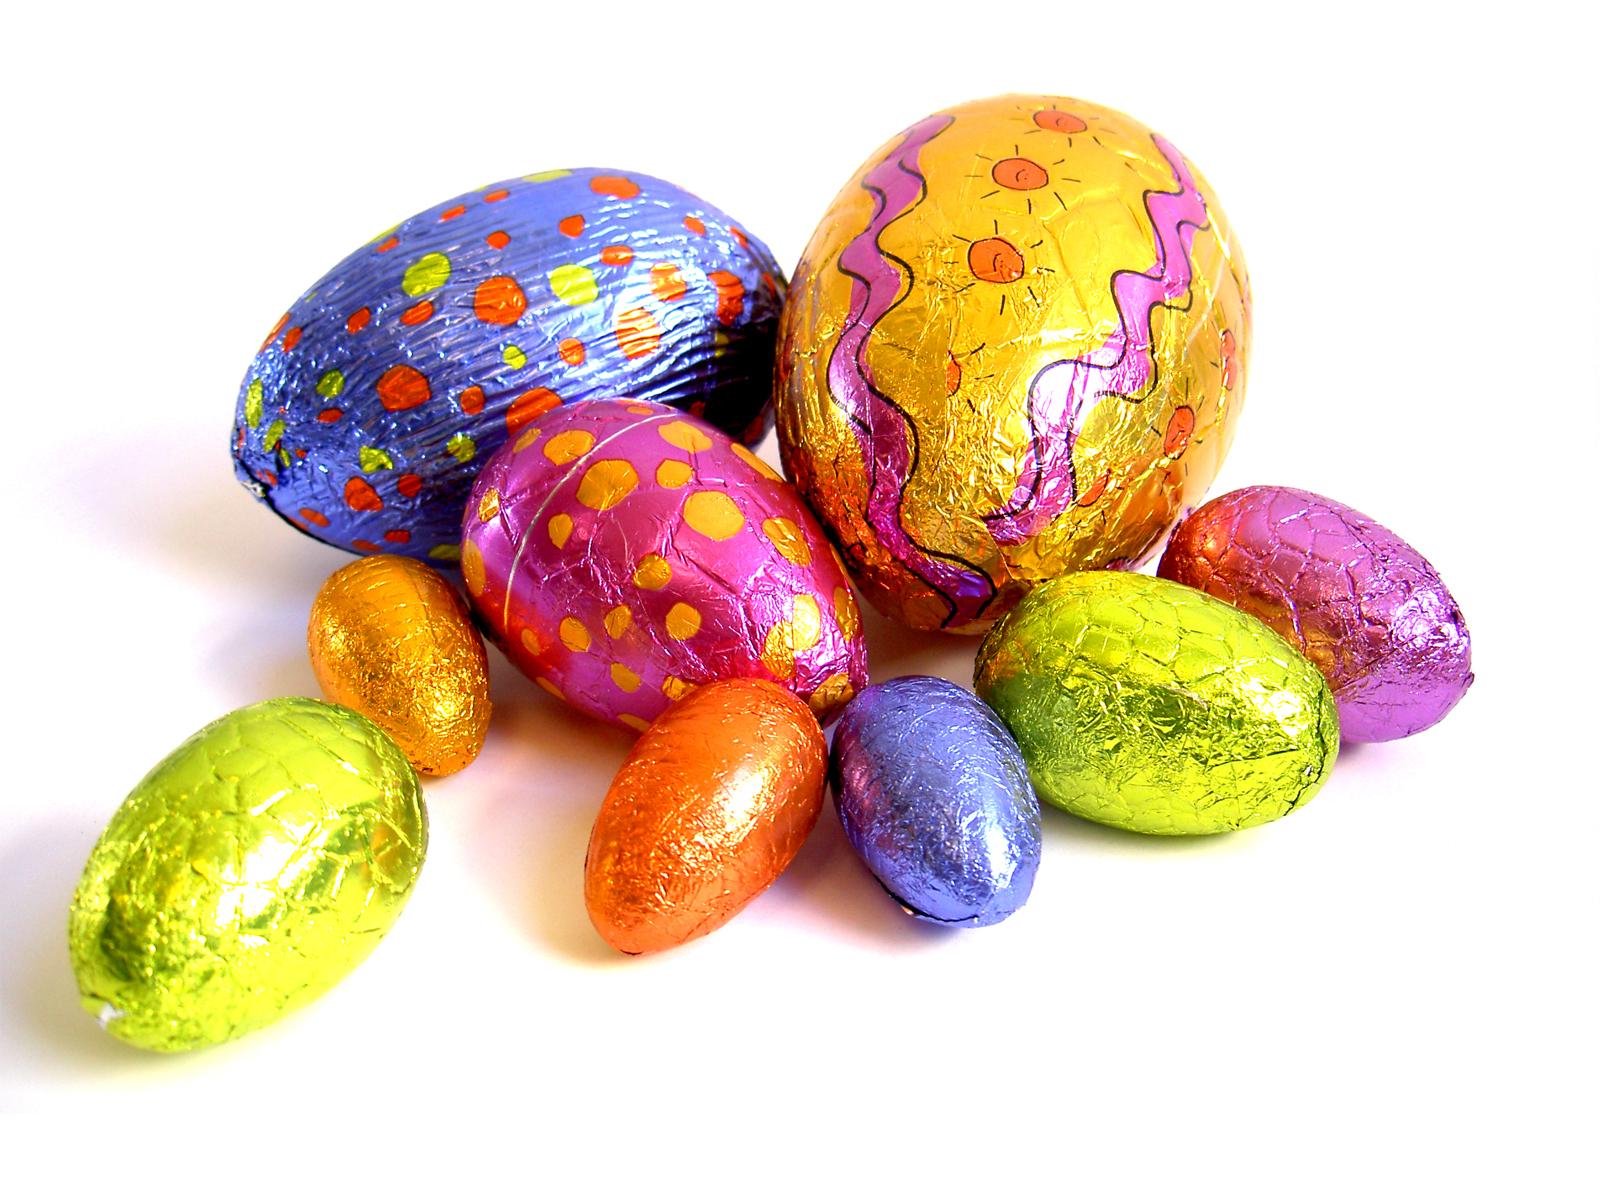 Beautiful Hd Wallpapers Beautiful Chocolate Easter Eggs Wallpaper 2